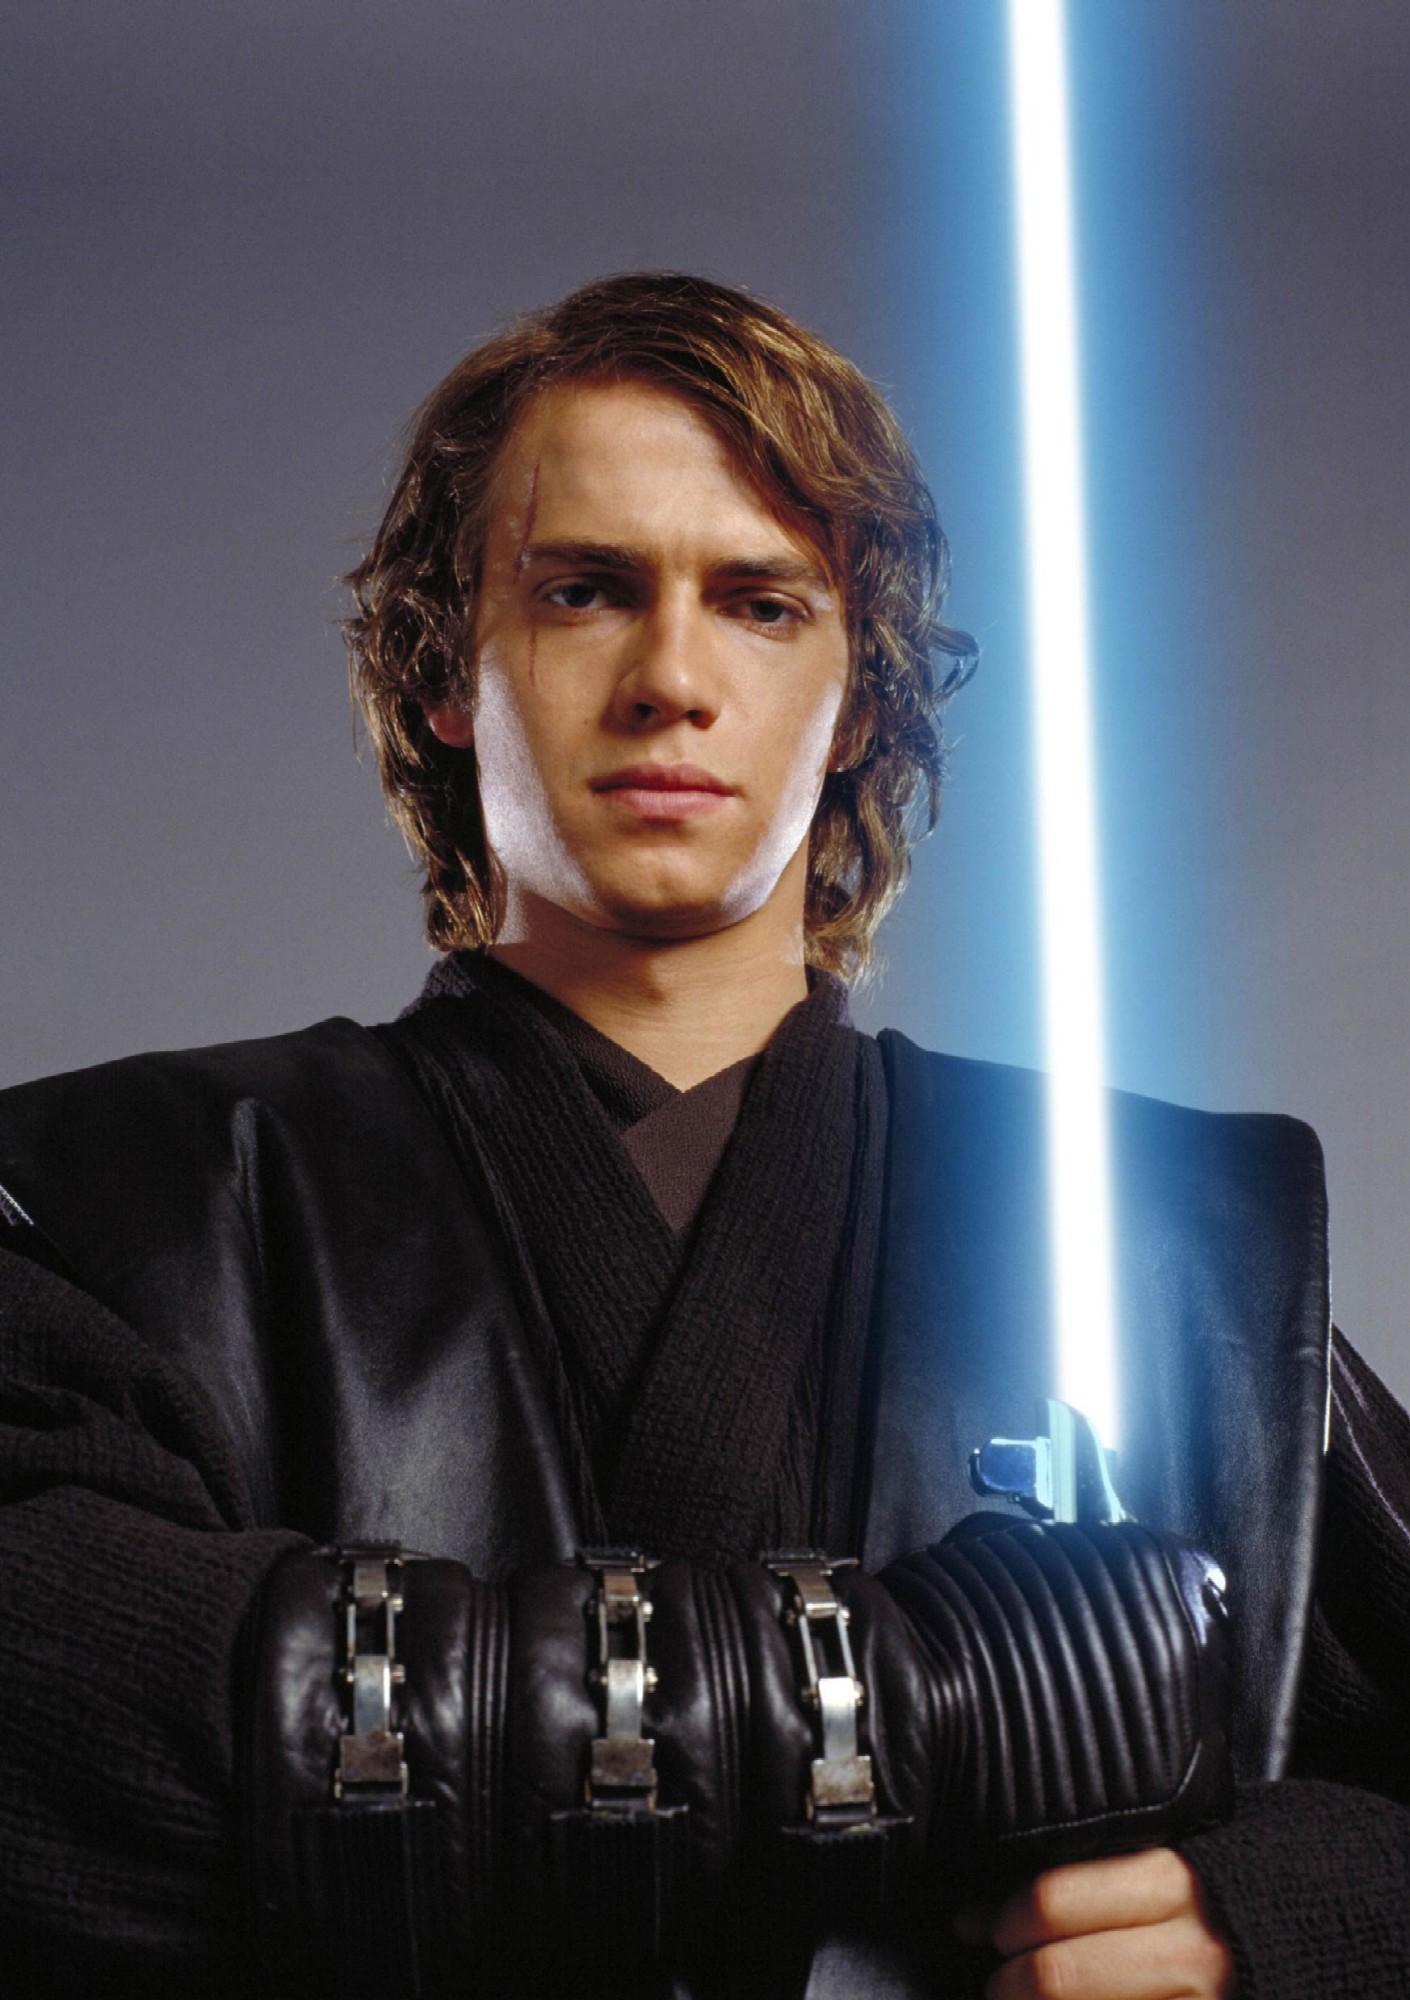 Star wars saga television programs star wars the clone wars video